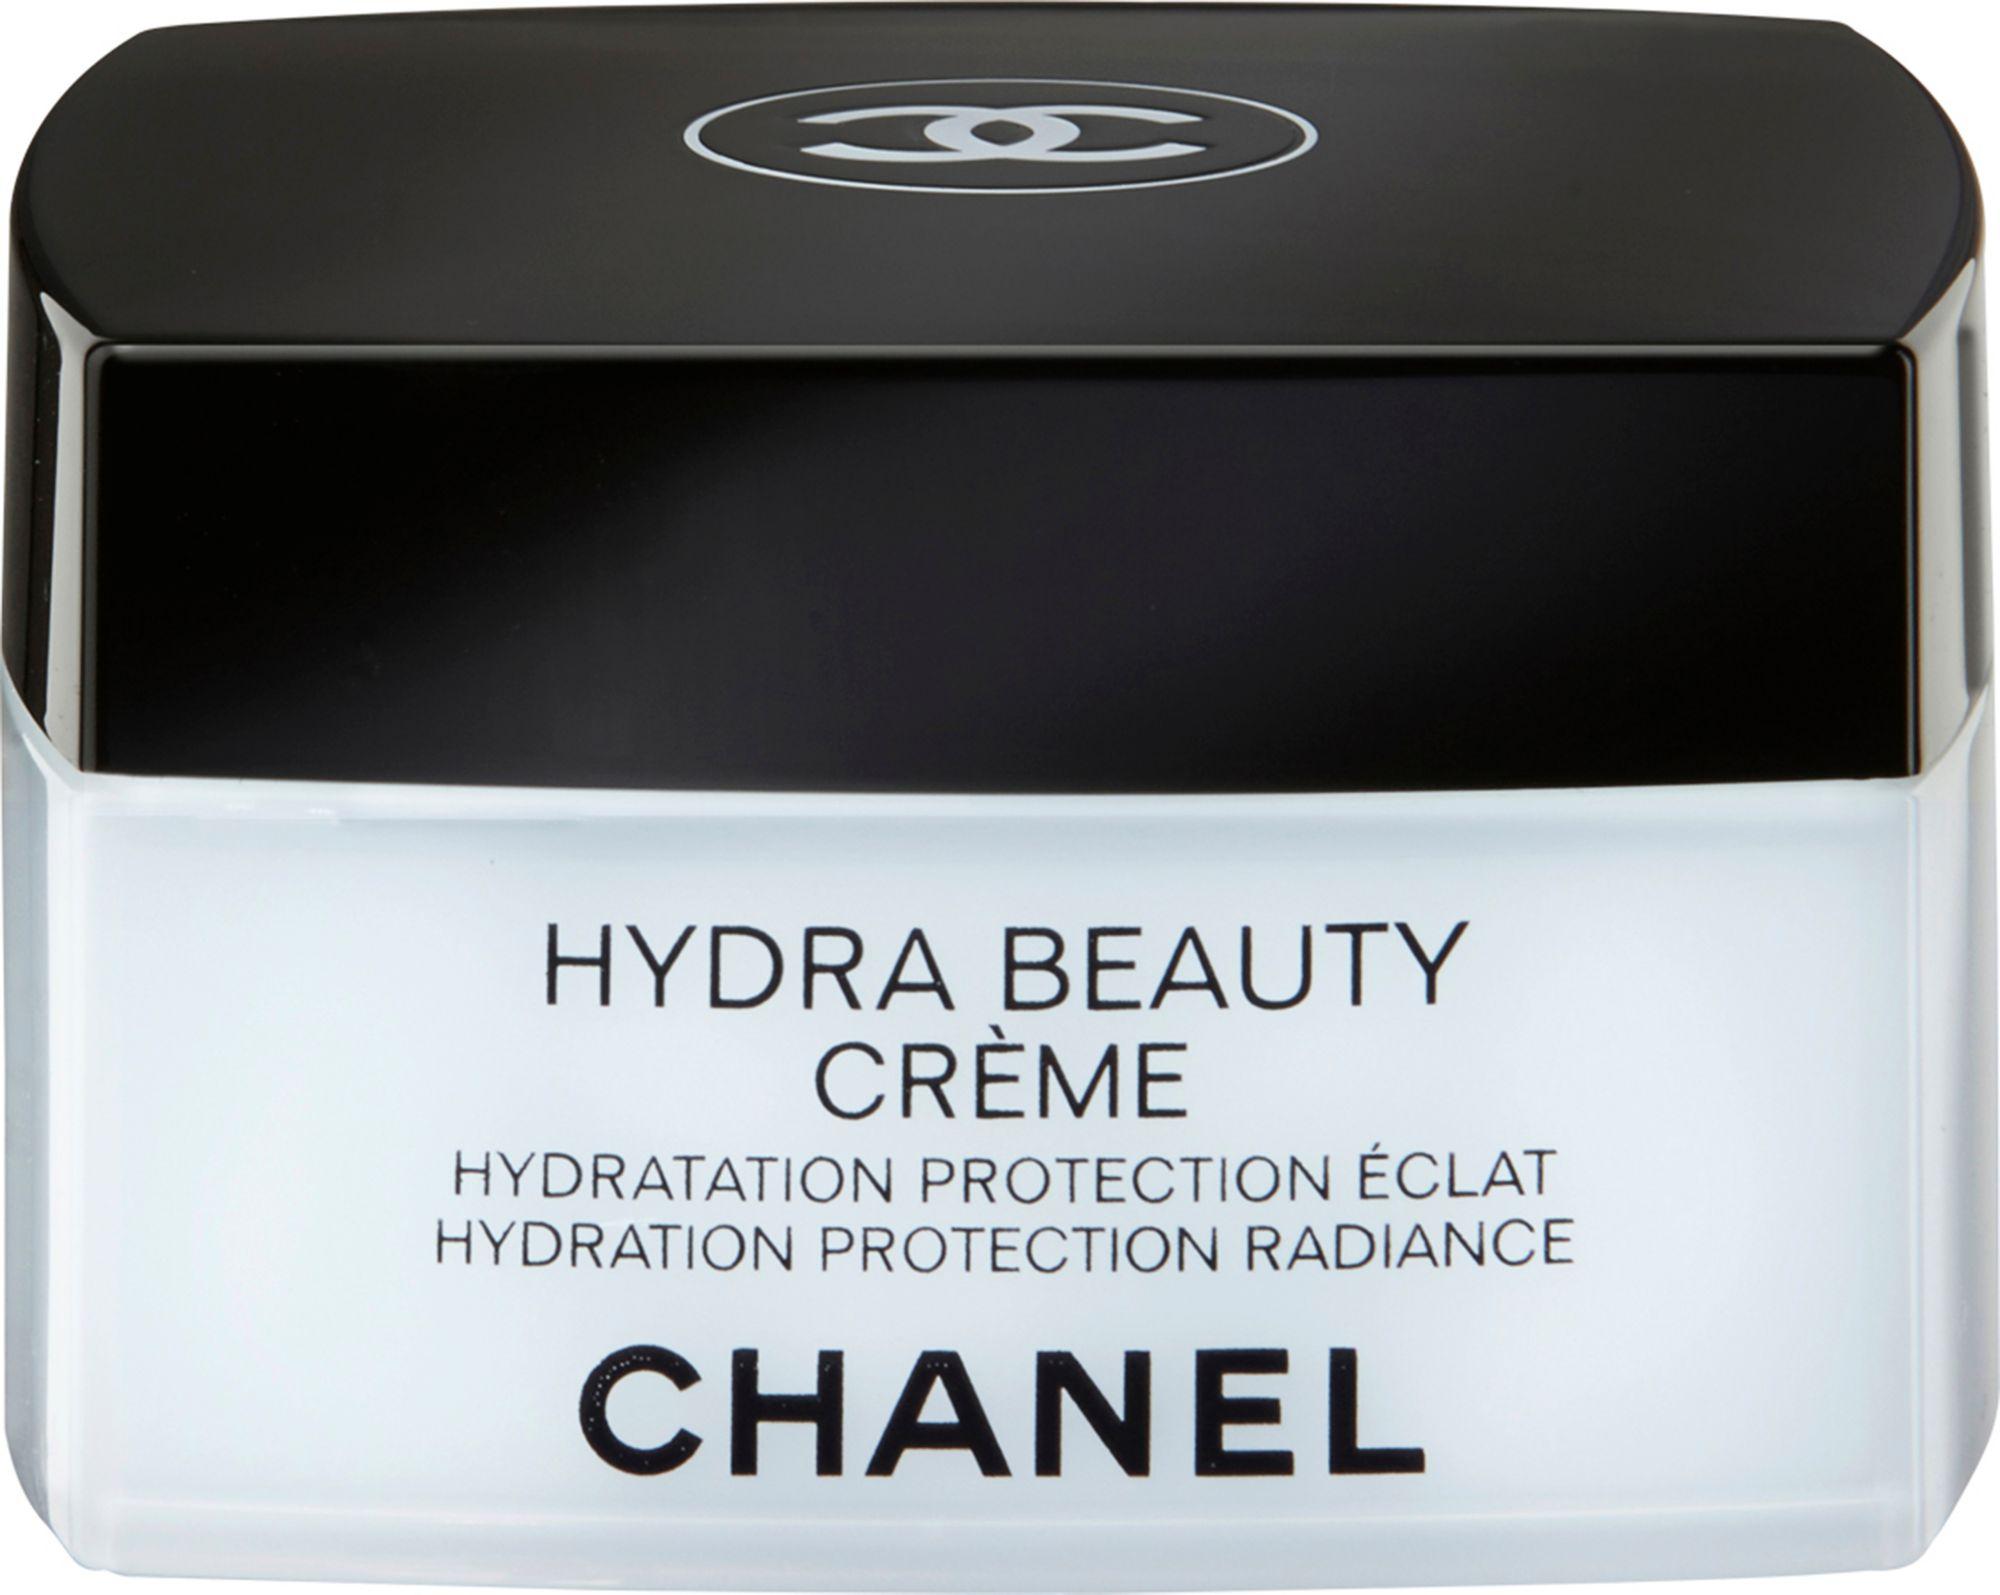 CHANEL Chanel, »Hydra Beauty Crème«, Gesichtscreme